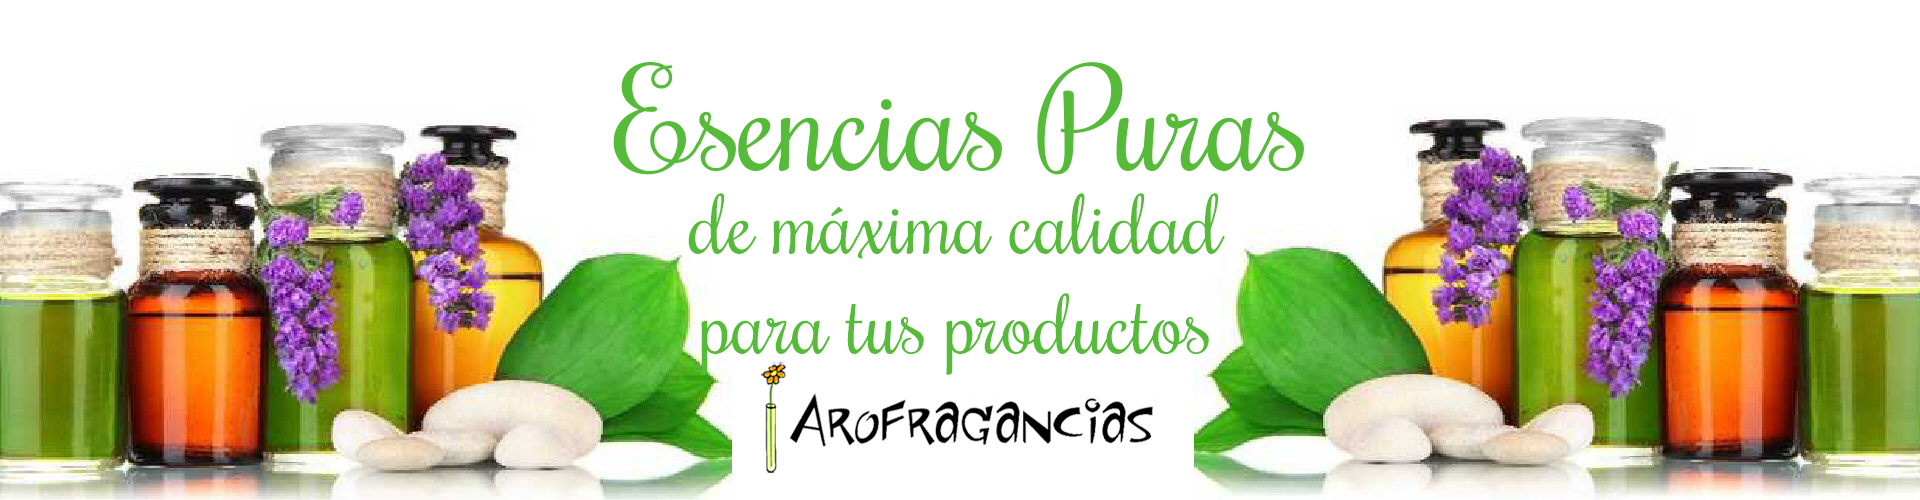 http://arofragancias.mitiendanube.com/